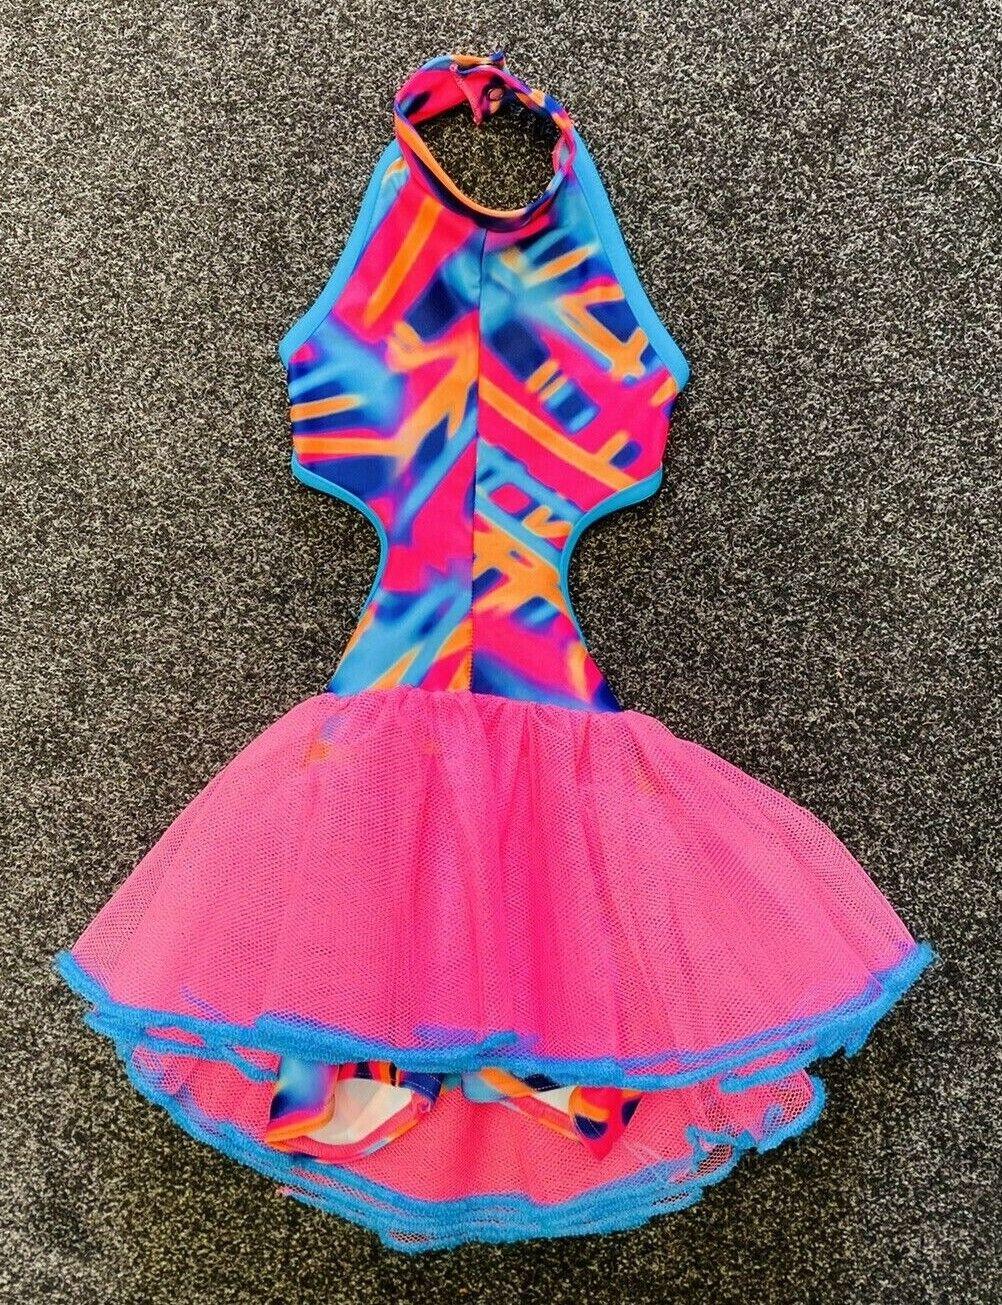 Multibeam MICHA DANCE UNITARD with Pink Tutu Skirt - Age 2 (Size 00) ~ Very Cute